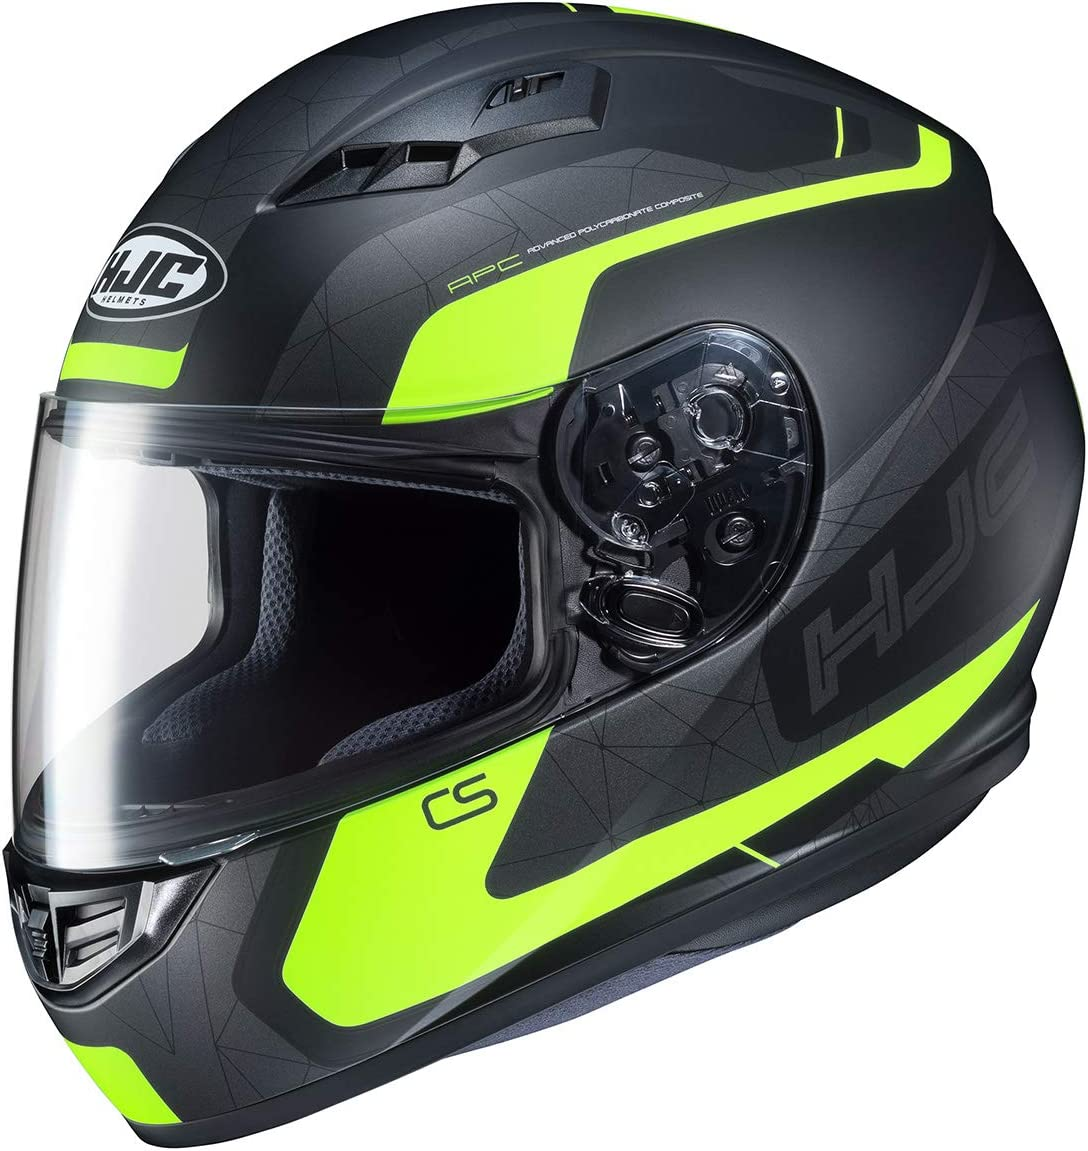 HJC Dosta成人雪地摩托头盔